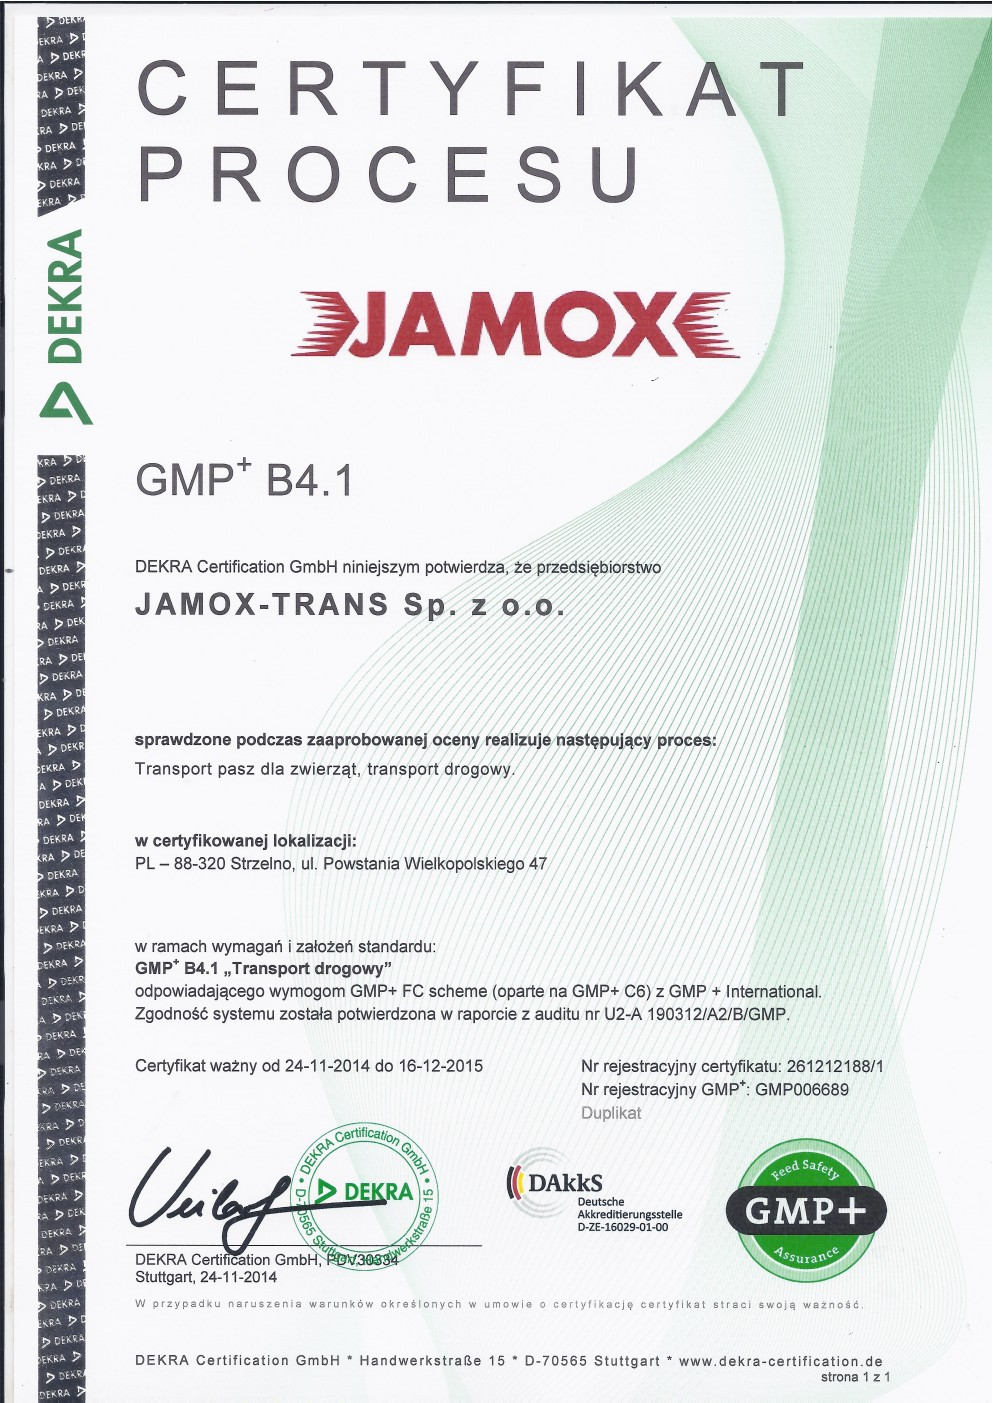 http://jamox.eu/wp-content/uploads/2019/05/gmp_pl.jpg